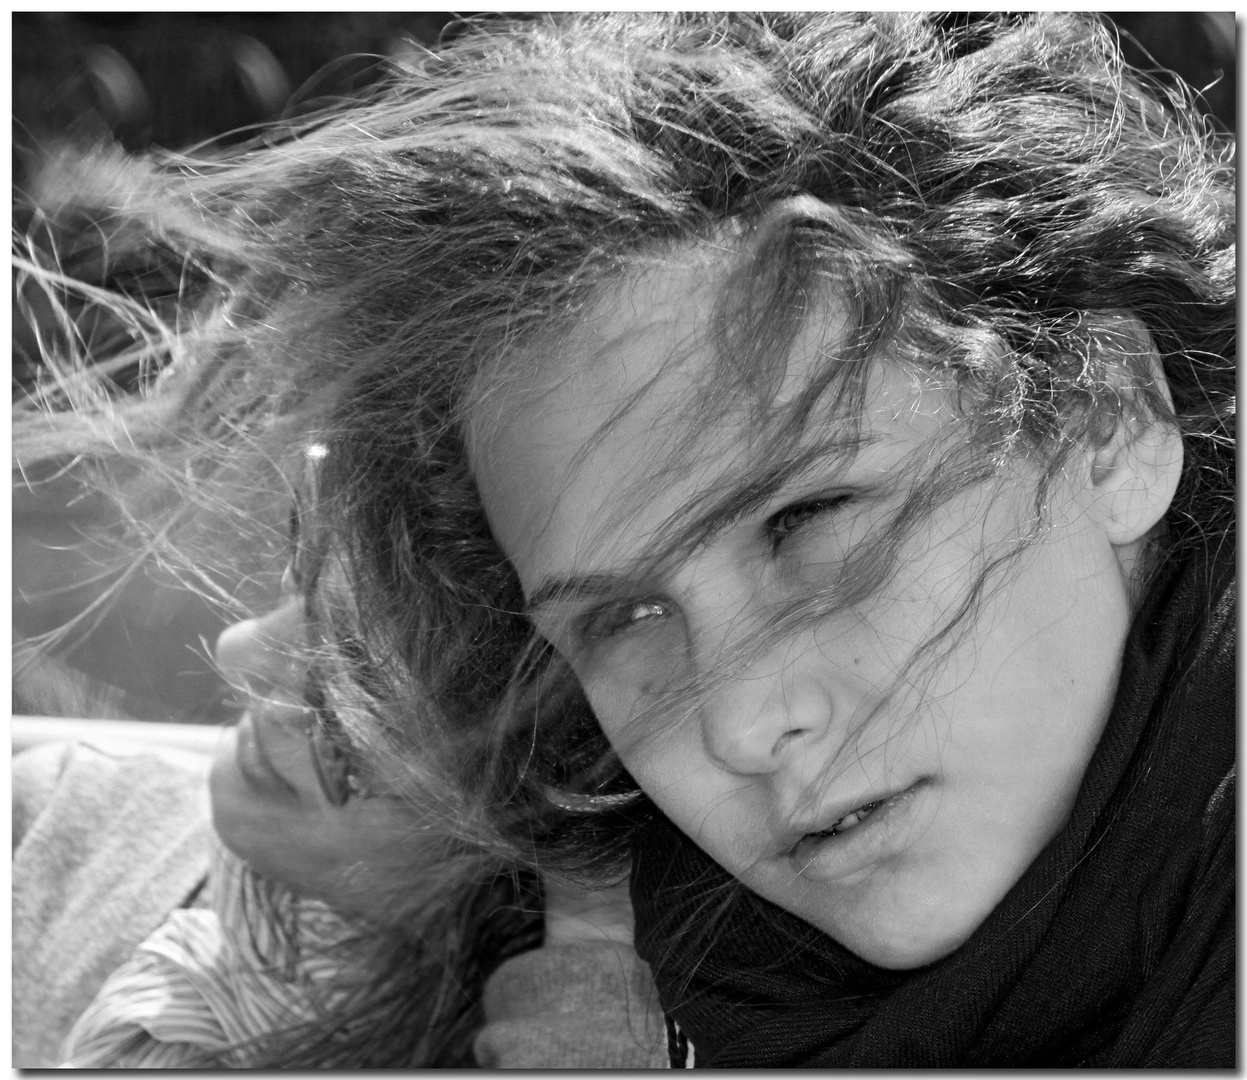 A windy portrait